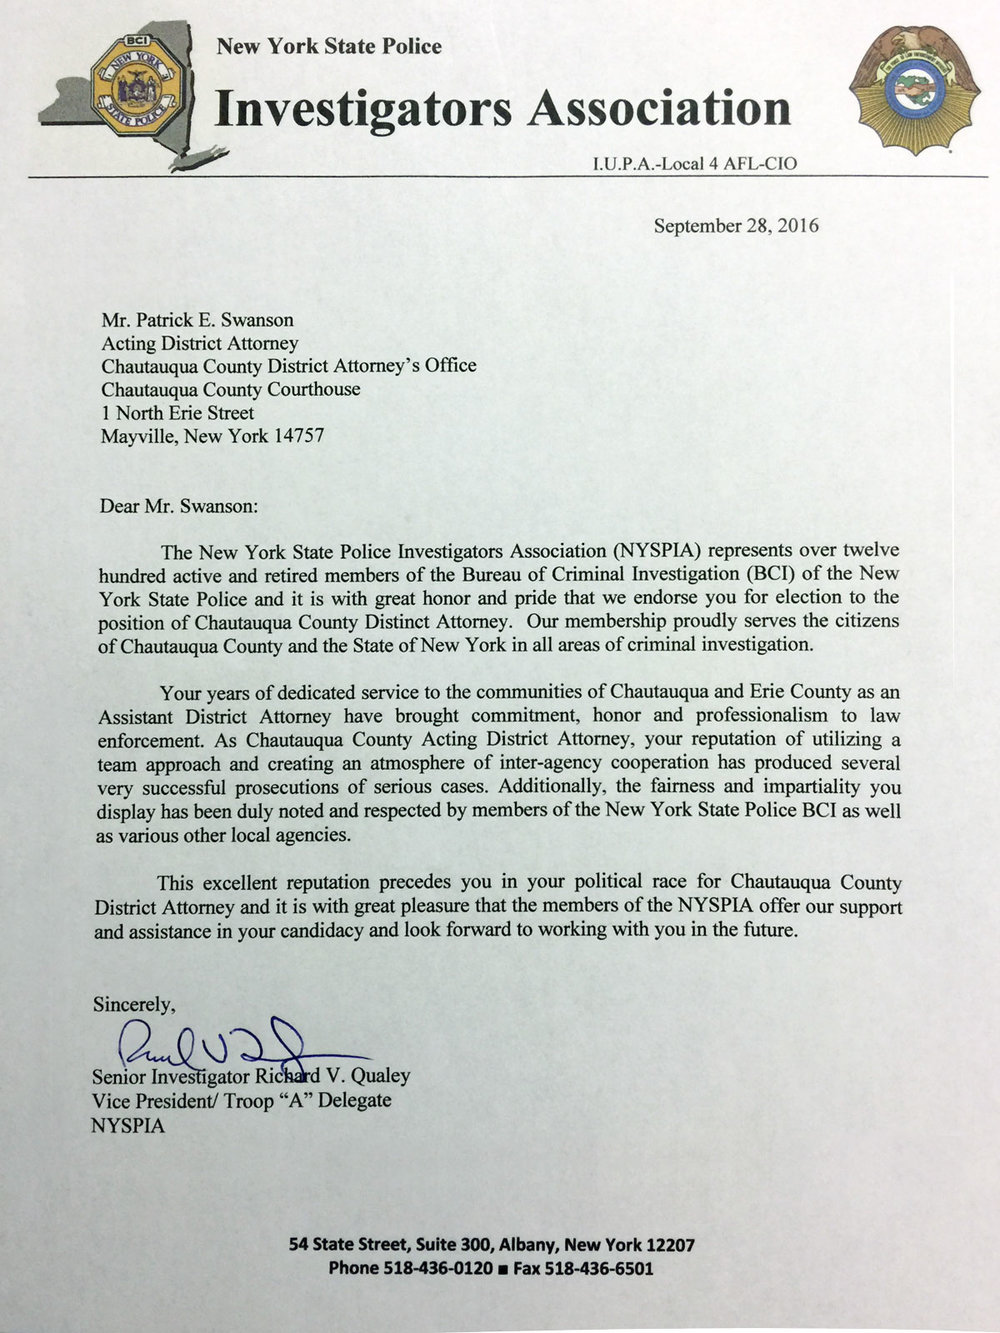 New York State Investigators Association